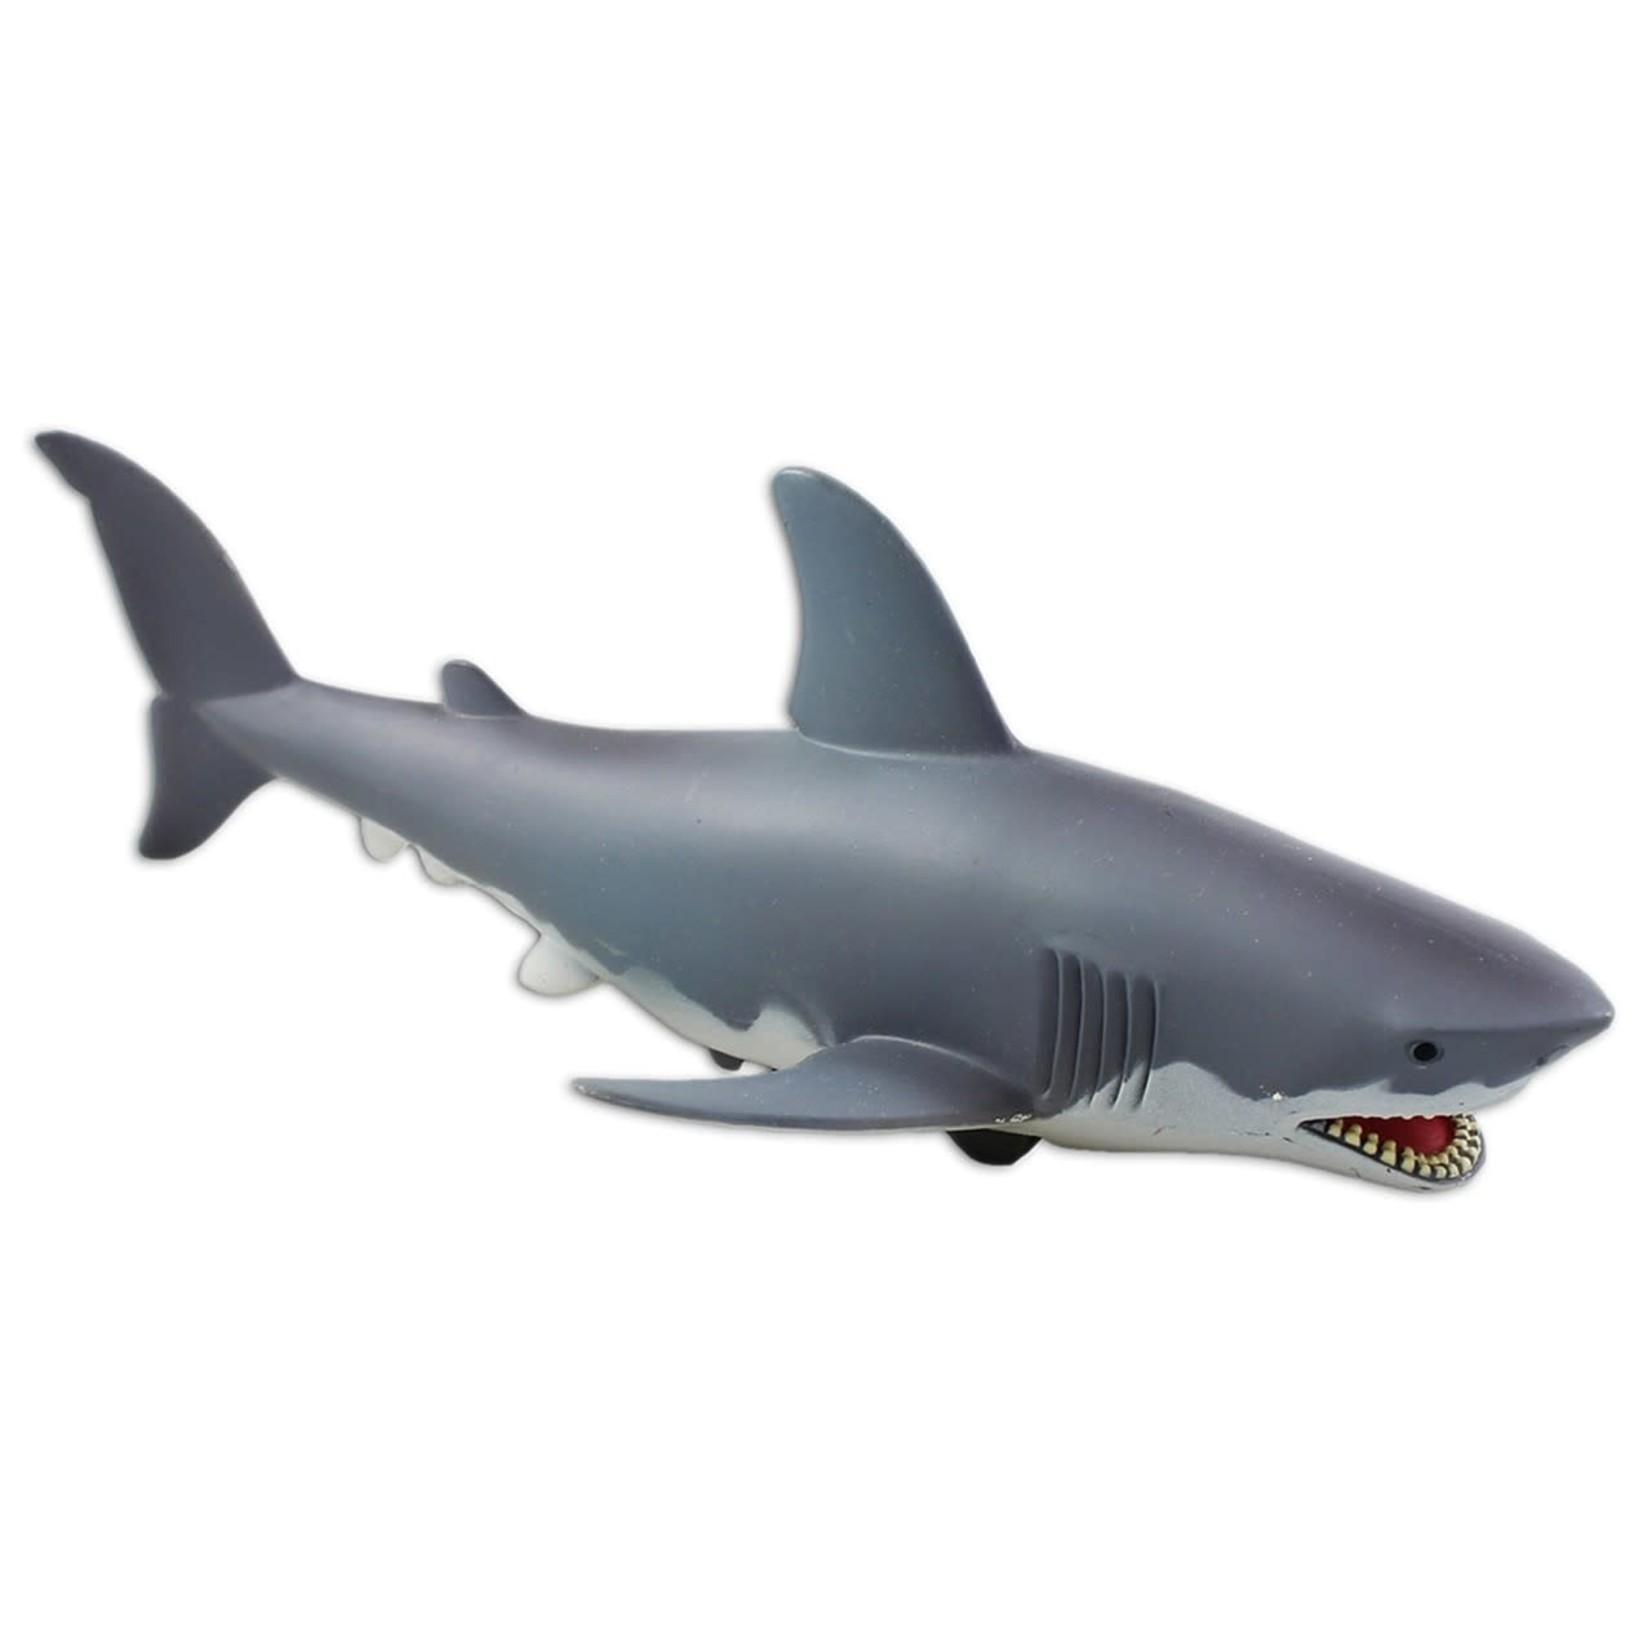 Ocean Wise Friction blue shark